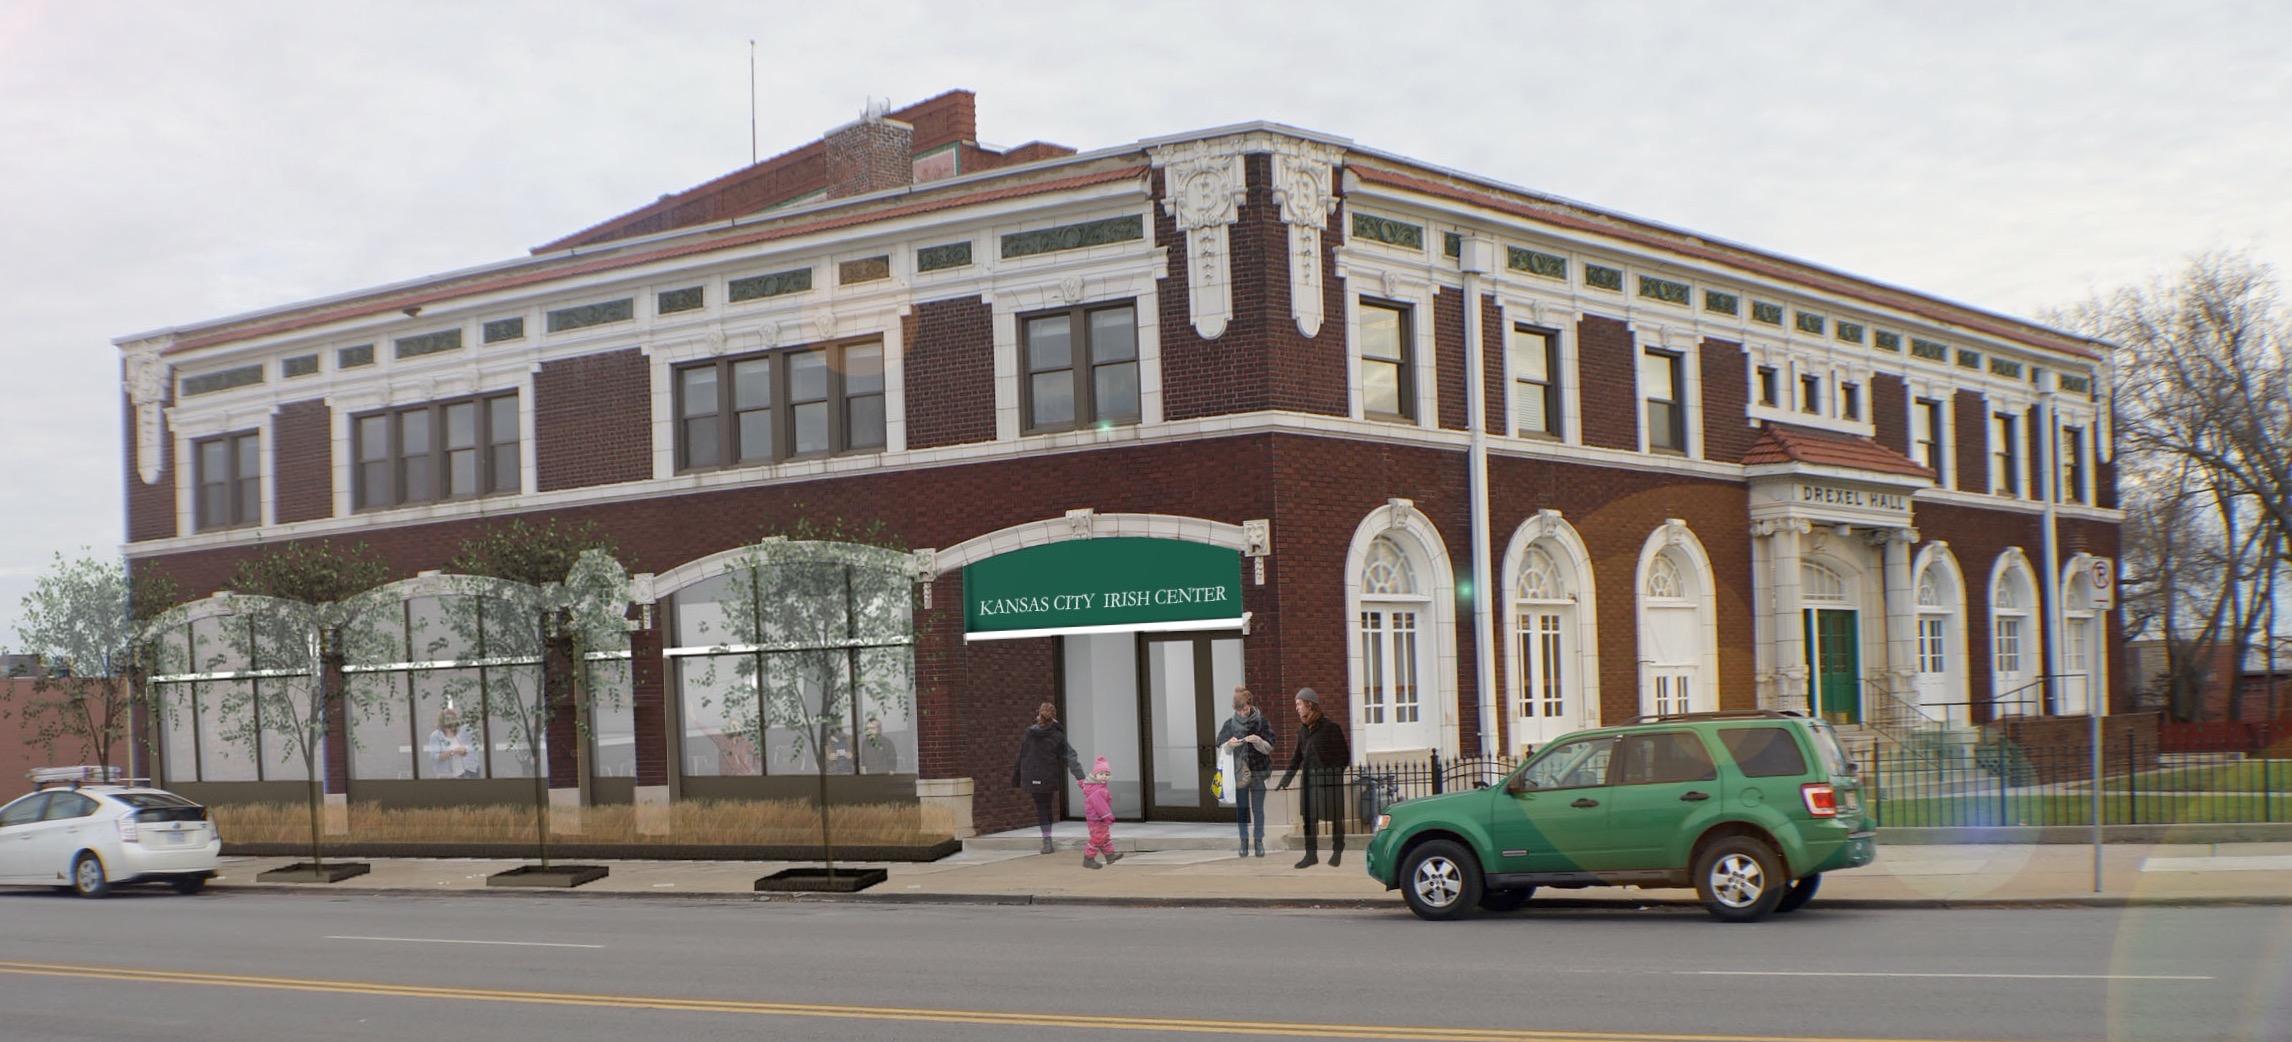 Kansas City Irish Center_exterior rendering